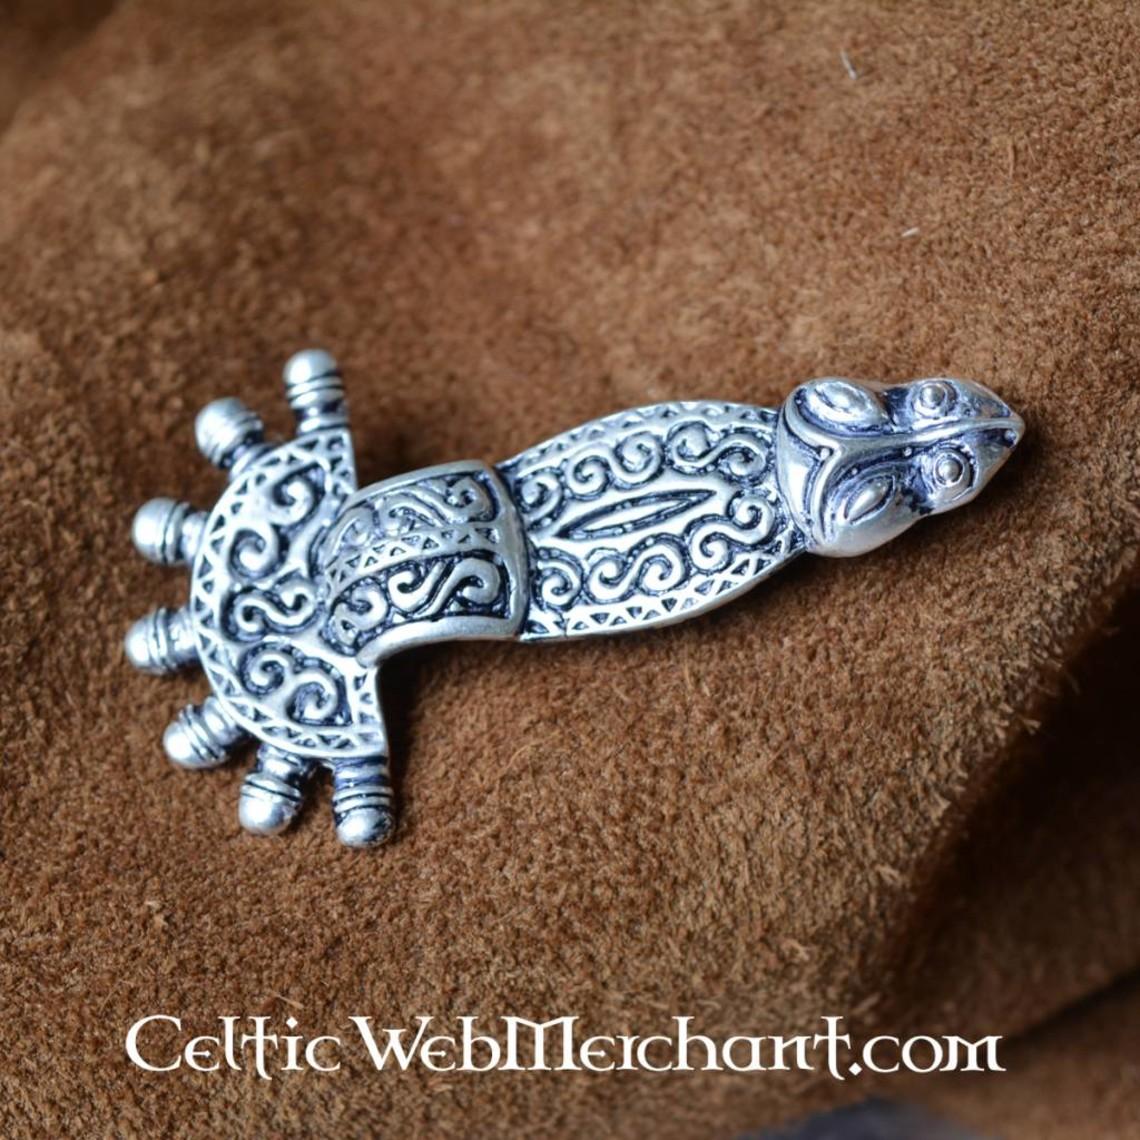 500-talet Merovingian fibula